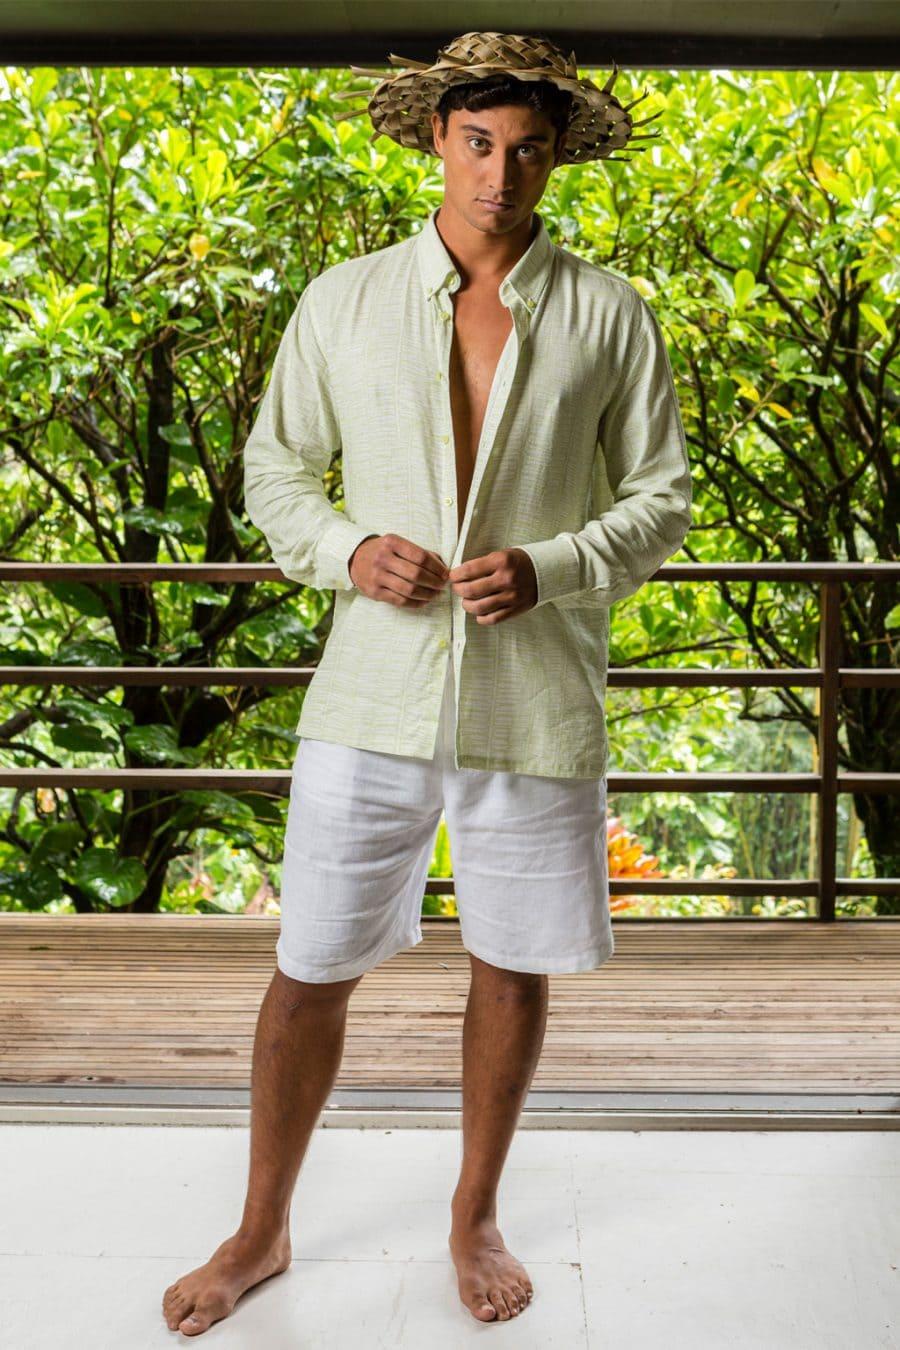 Male model wearing Aloha Long Sleeve in Tofu Margarita Kupukupu pattern front view